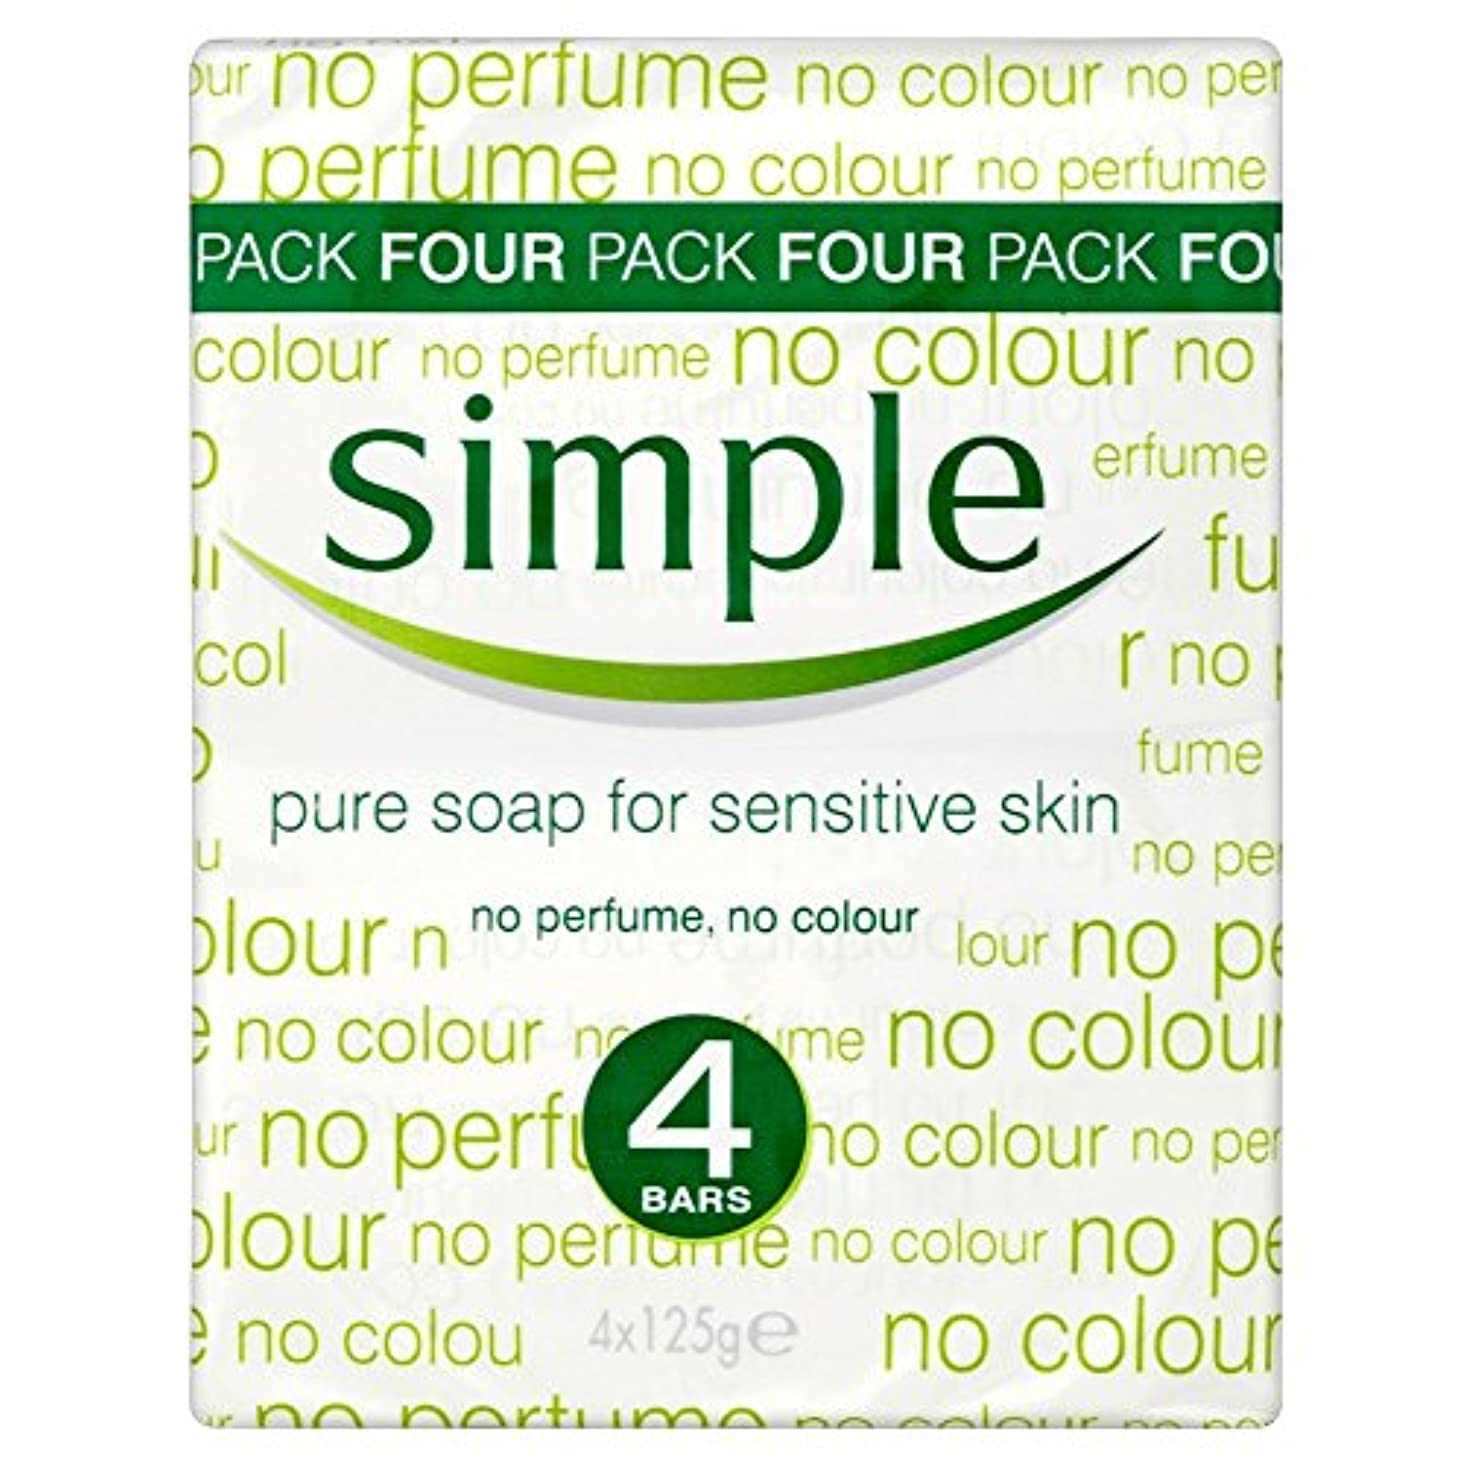 Simple Pure Soap for Sensitive Skin (4x125g) 敏感肌のためのシンプルな純粋な石鹸( 4X125G ) [並行輸入品]